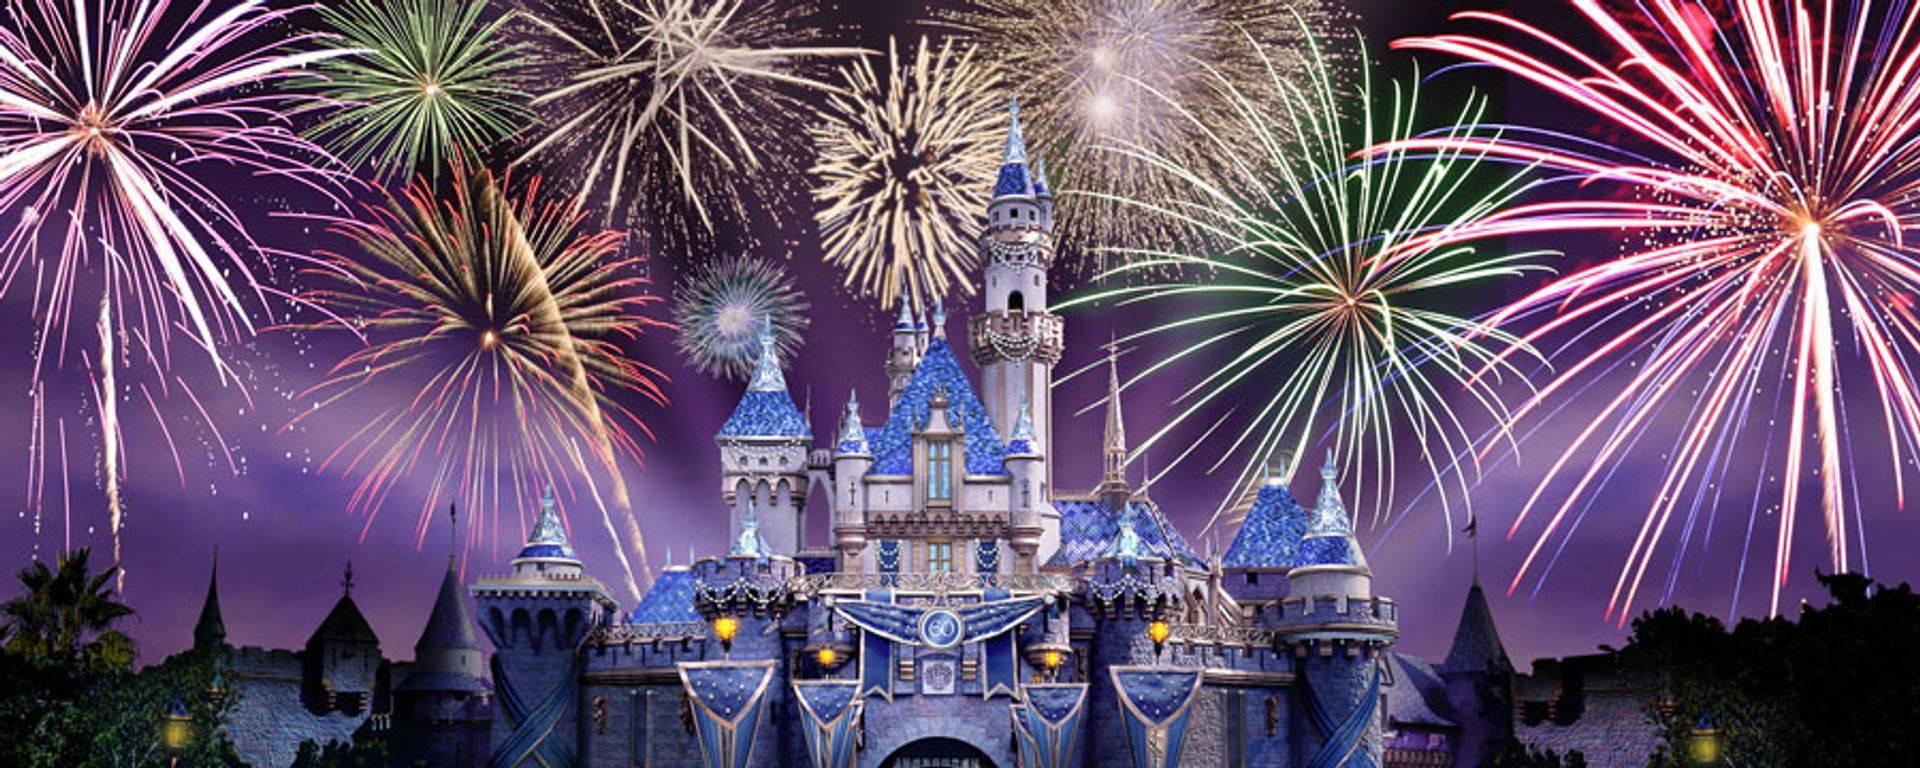 Disney Characters in Magic Kingdom